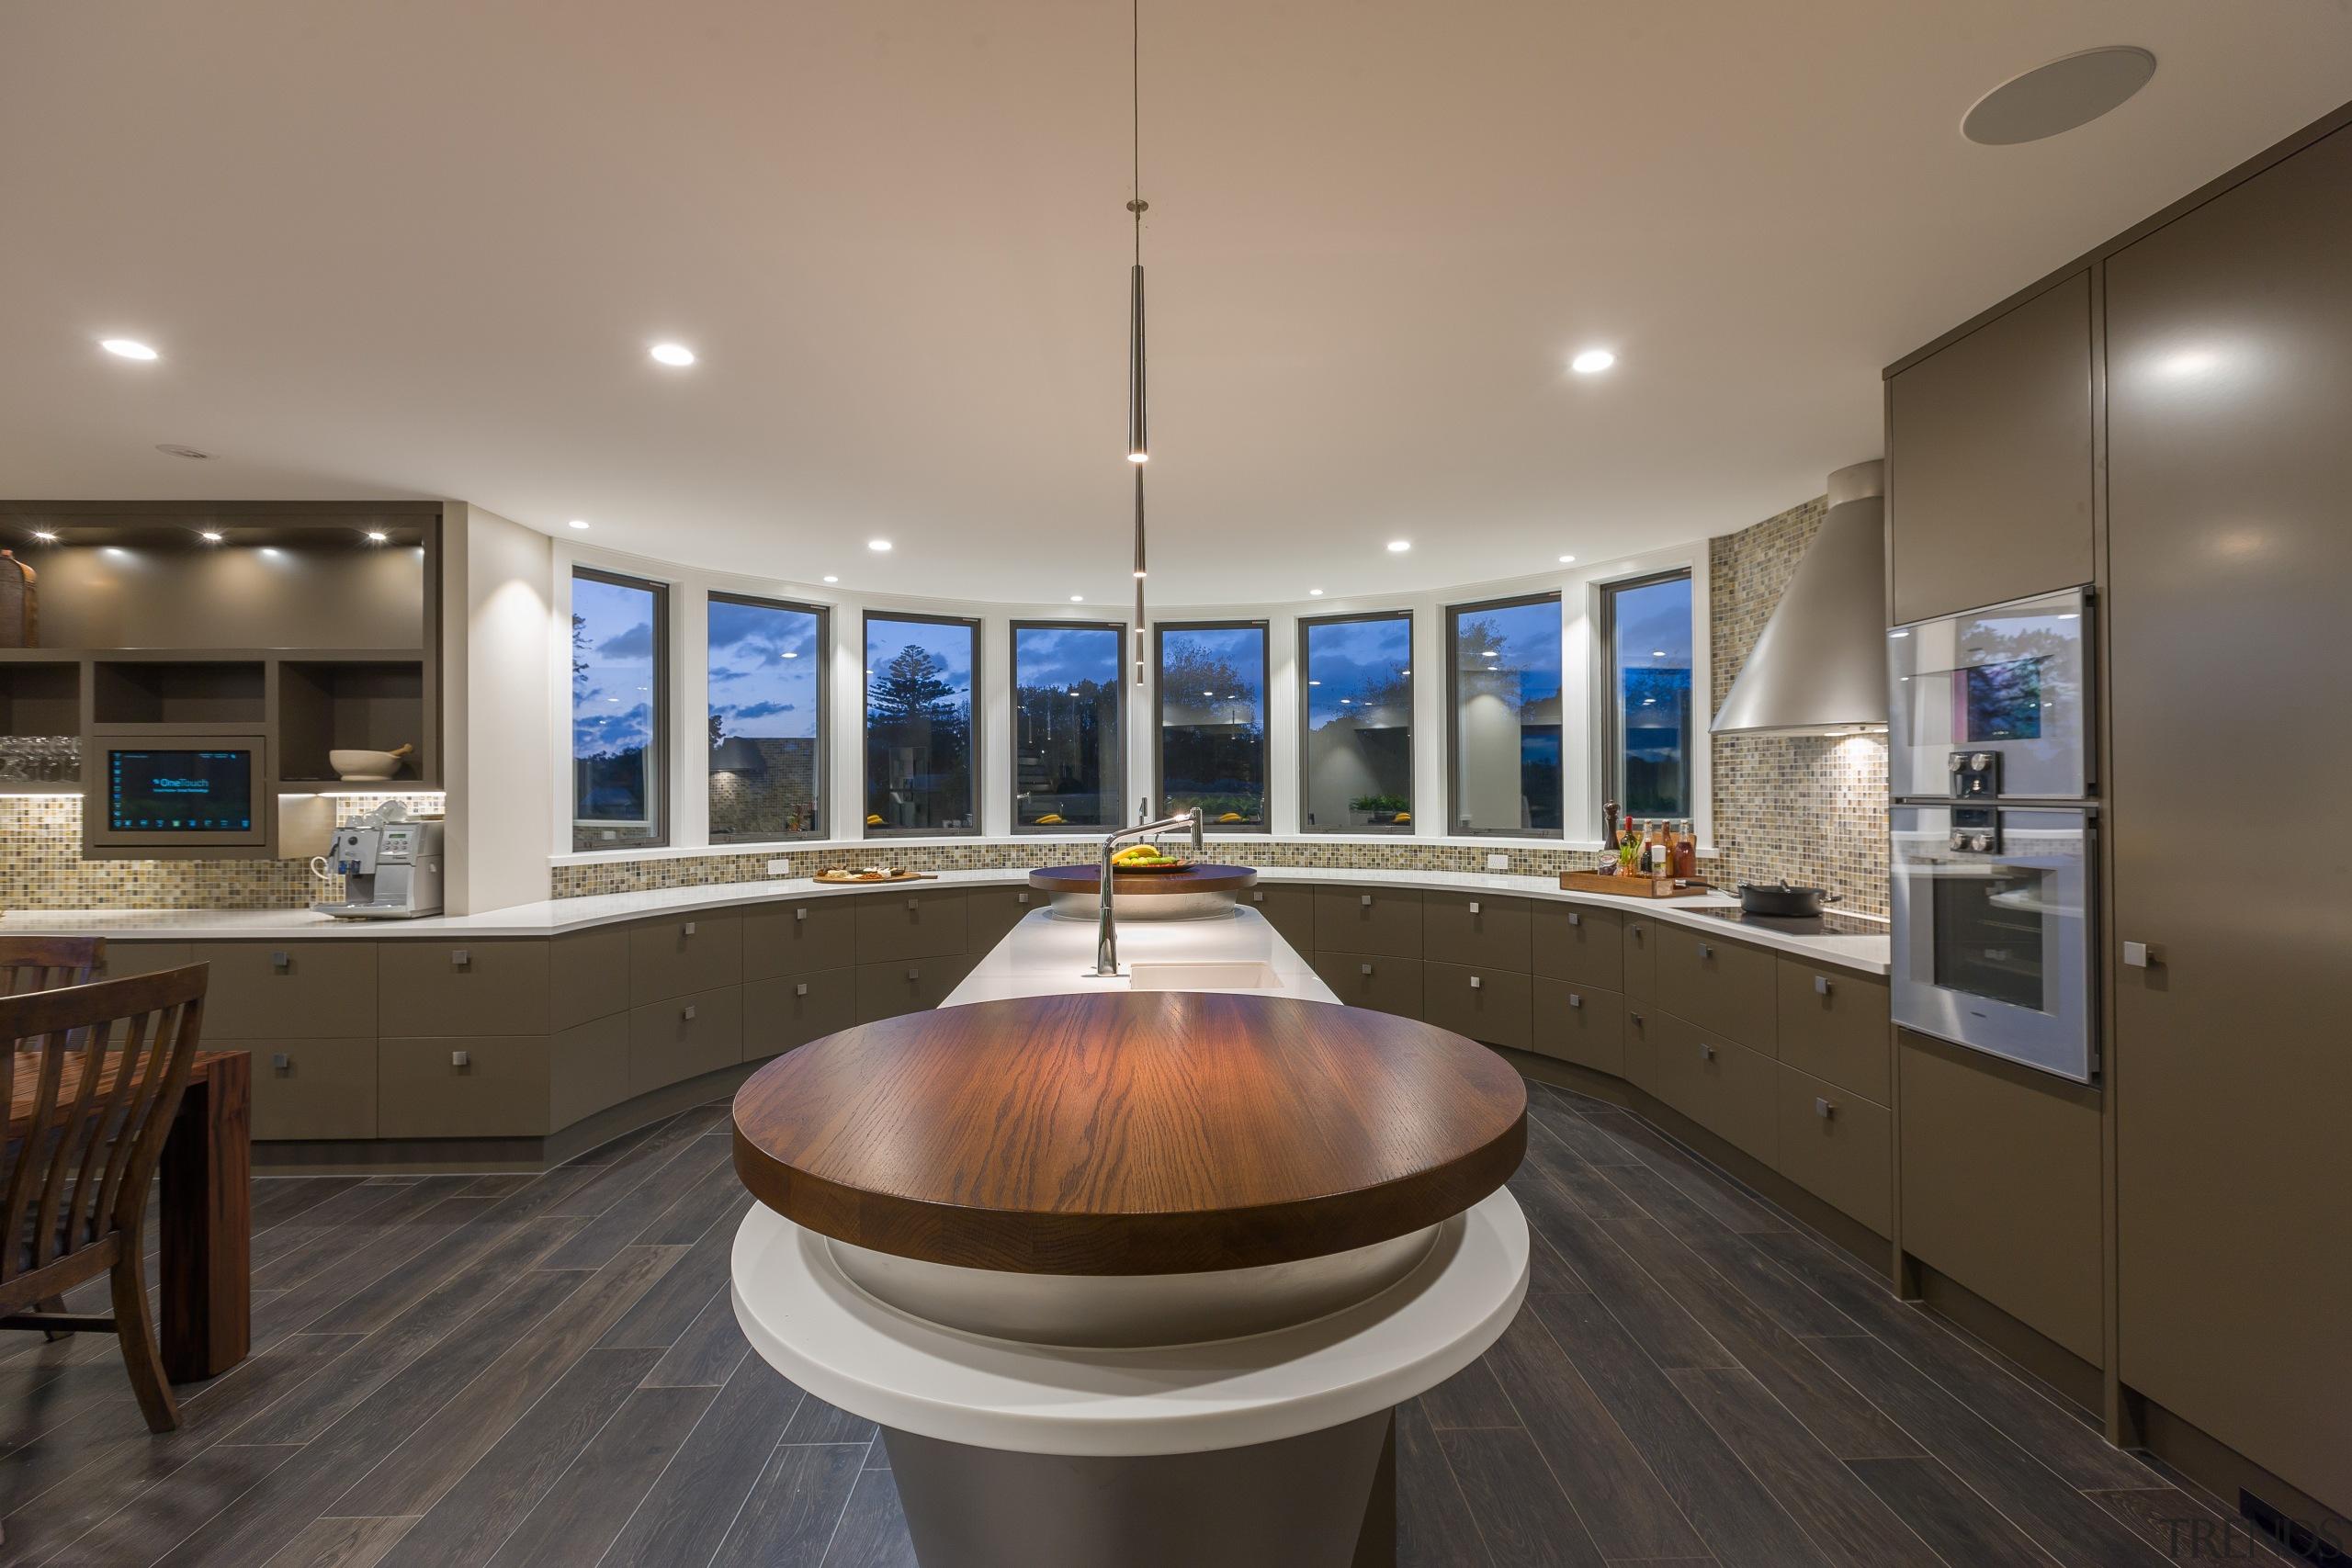 In this kitchen by Celia Visser Design, the countertop, interior design, kitchen, real estate, gray, black